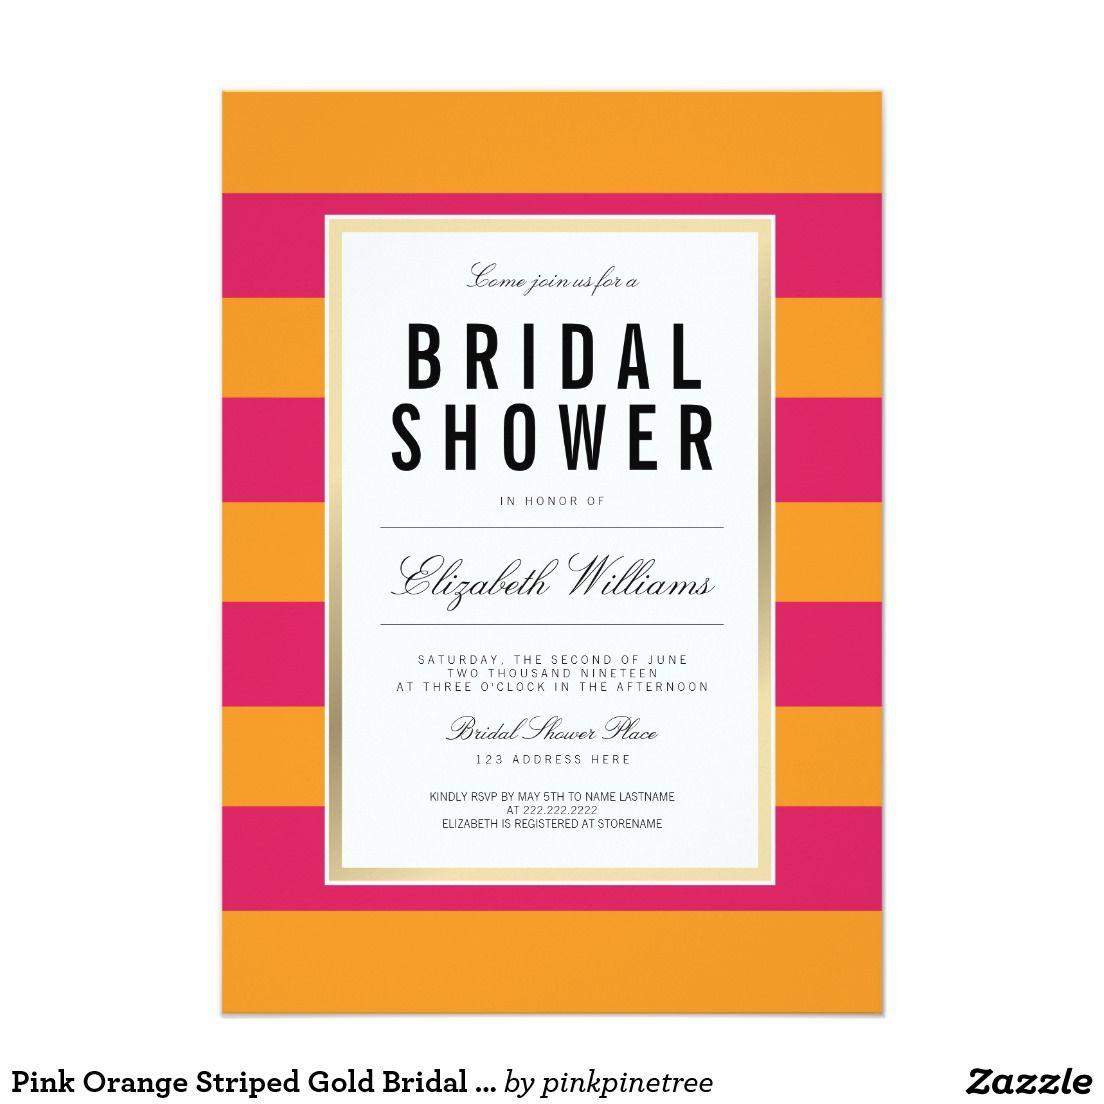 Pink Orange Striped Gold Bridal Shower Invite